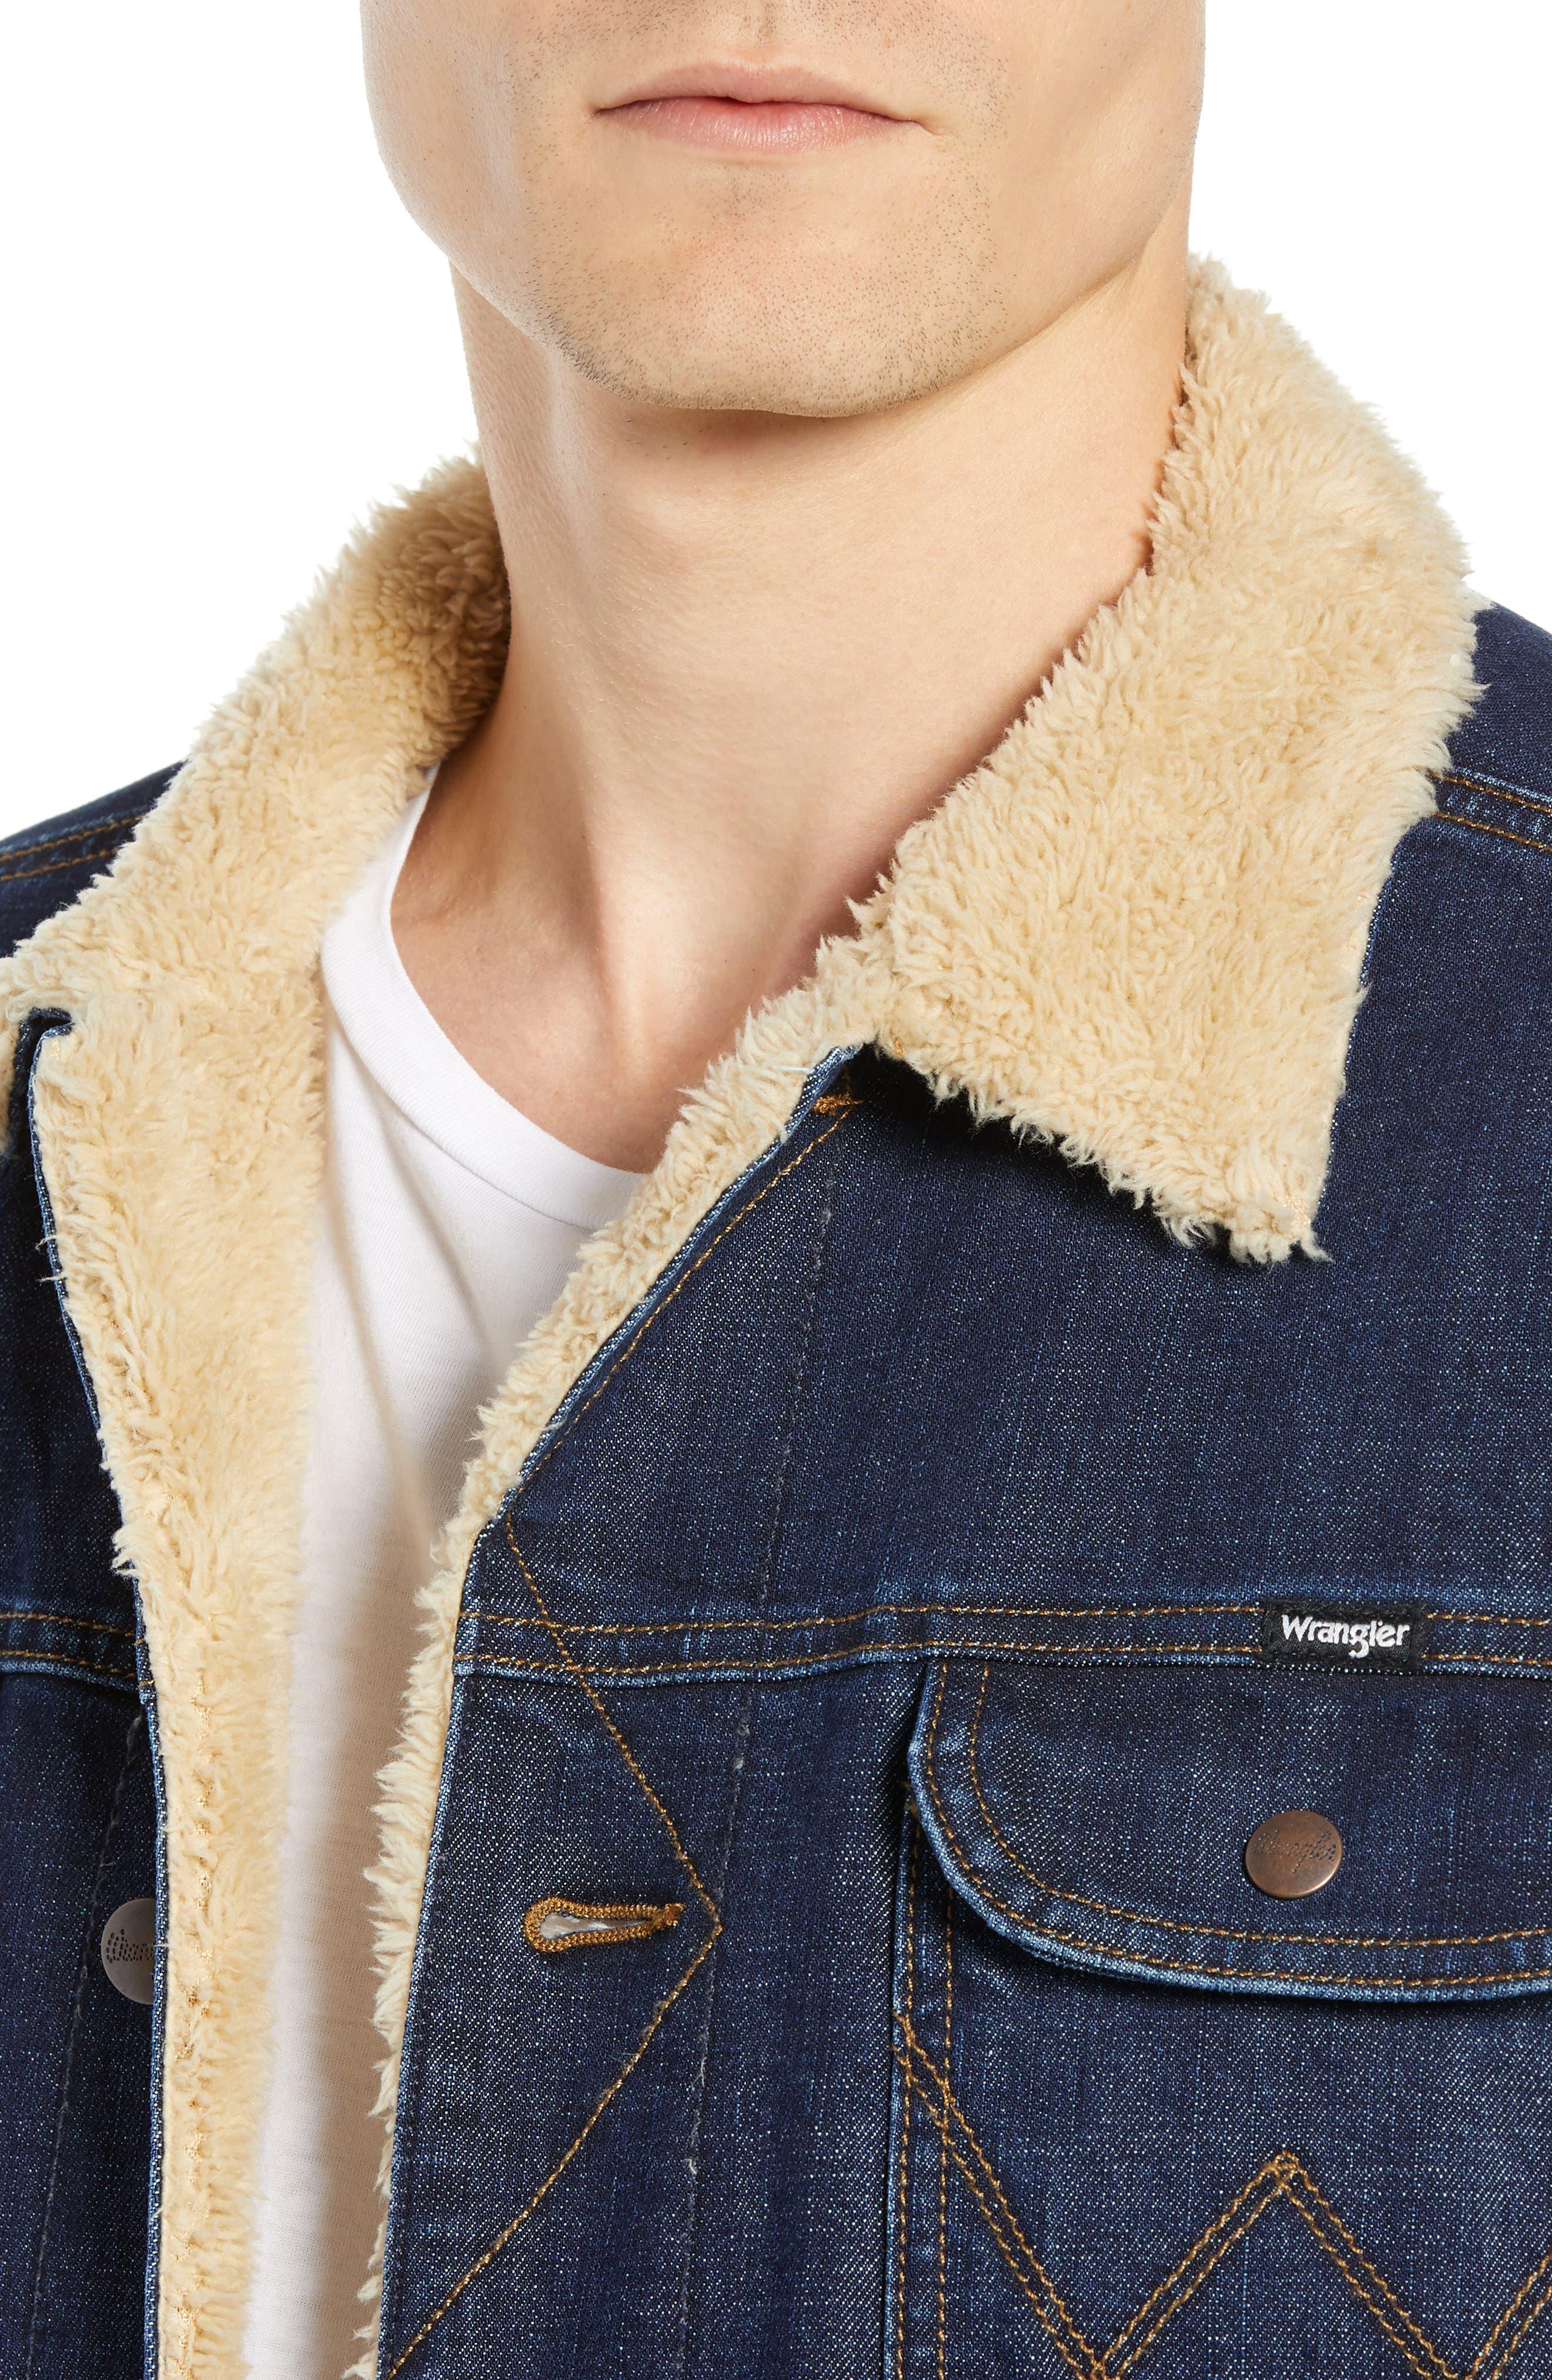 WRANGLER, Heritage Fleece Lined Denim Jacket, Alternate thumbnail 5, color, 472